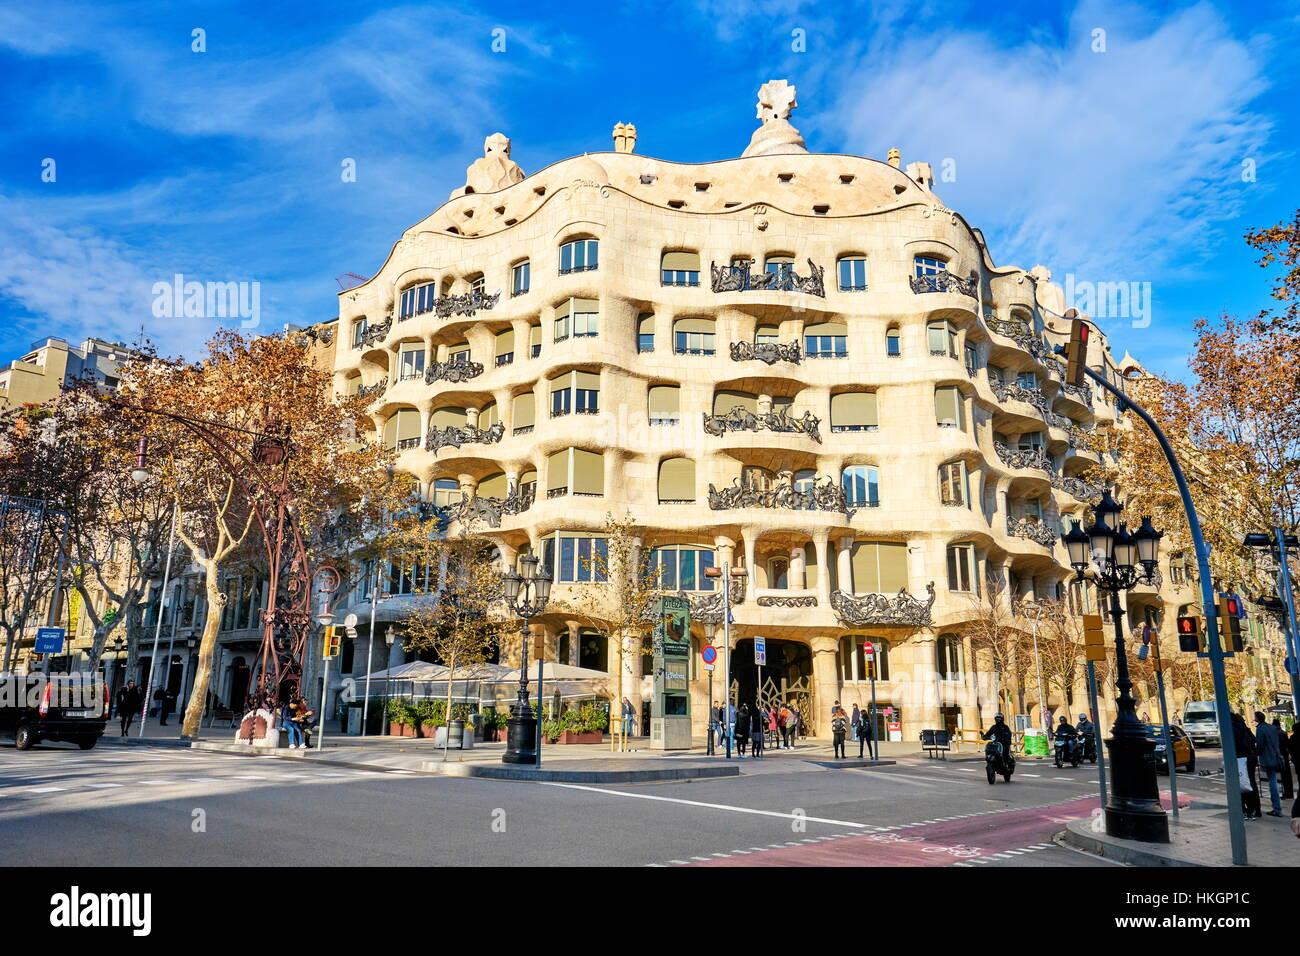 La Pedrera Bauplanung von Antoni Gaudi, Barcelona, Katalonien, Spanien Stockbild